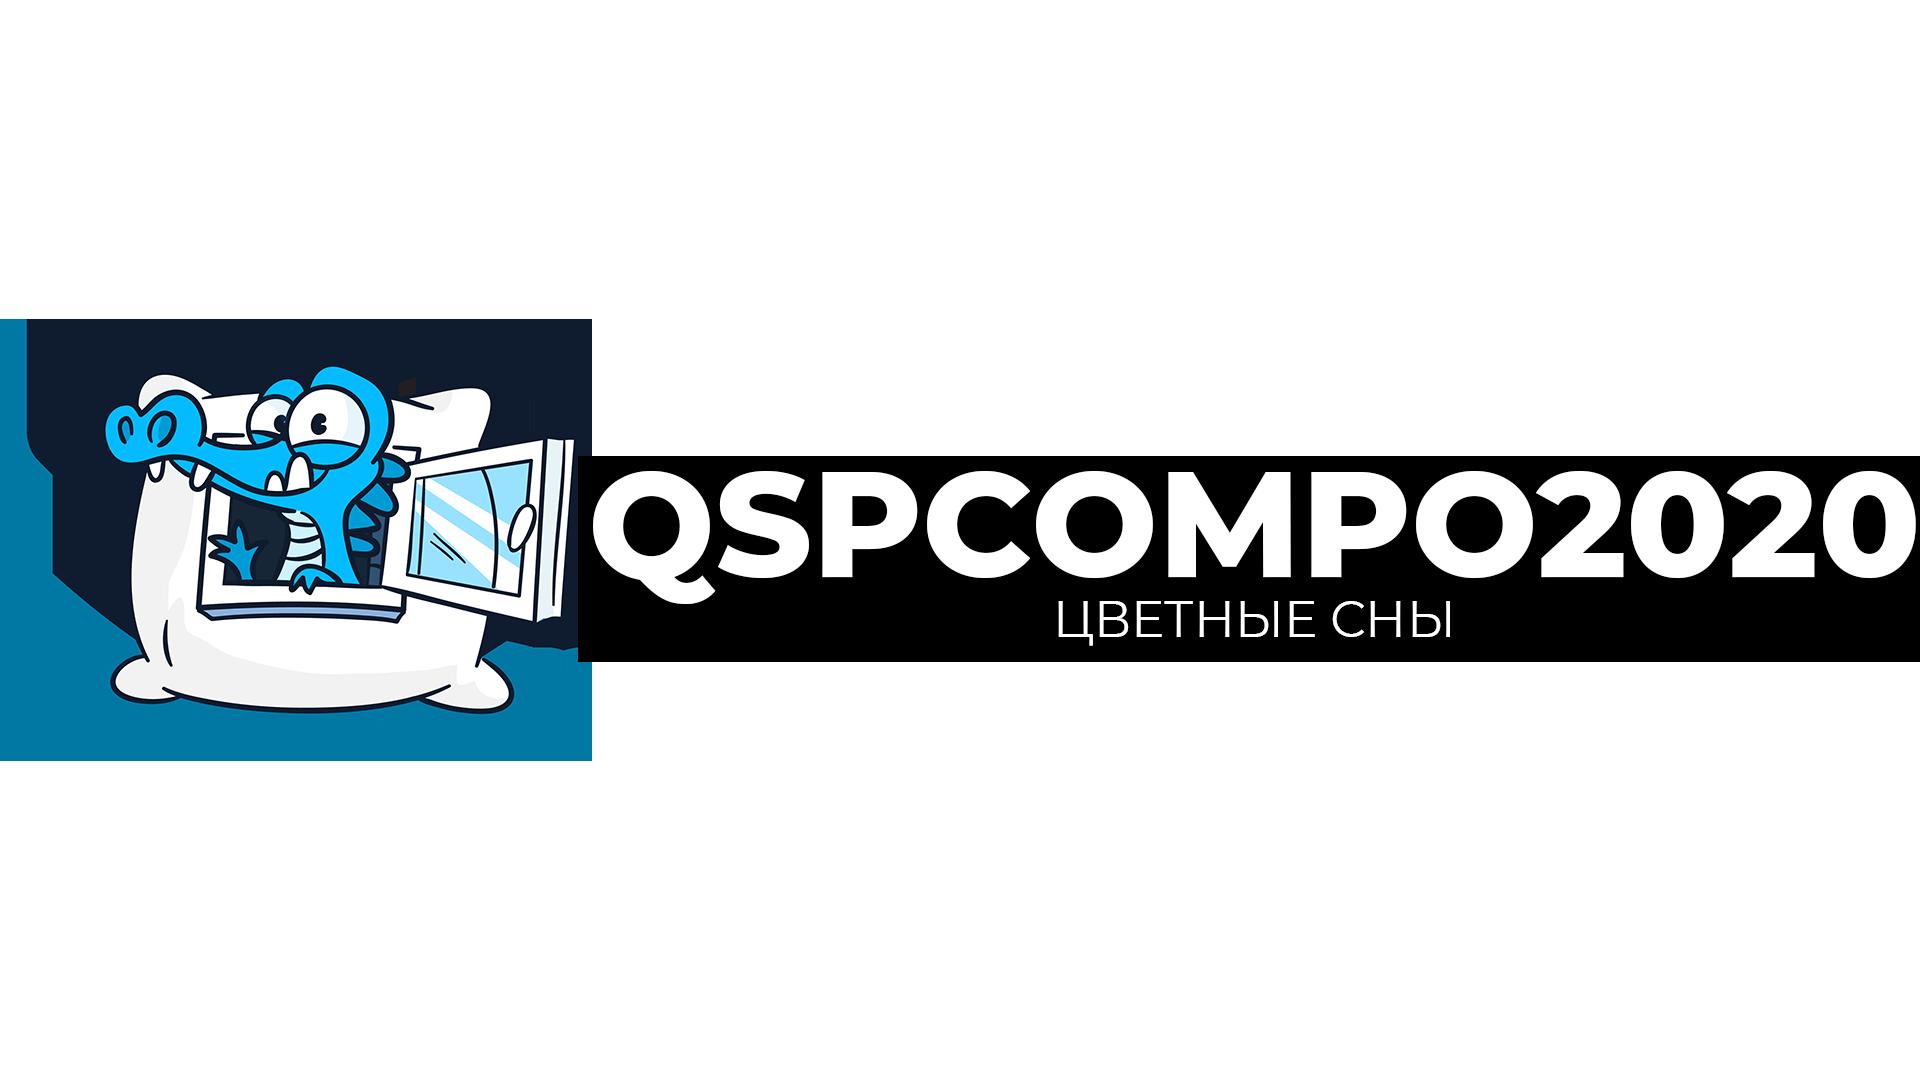 QSPCOMPO2020